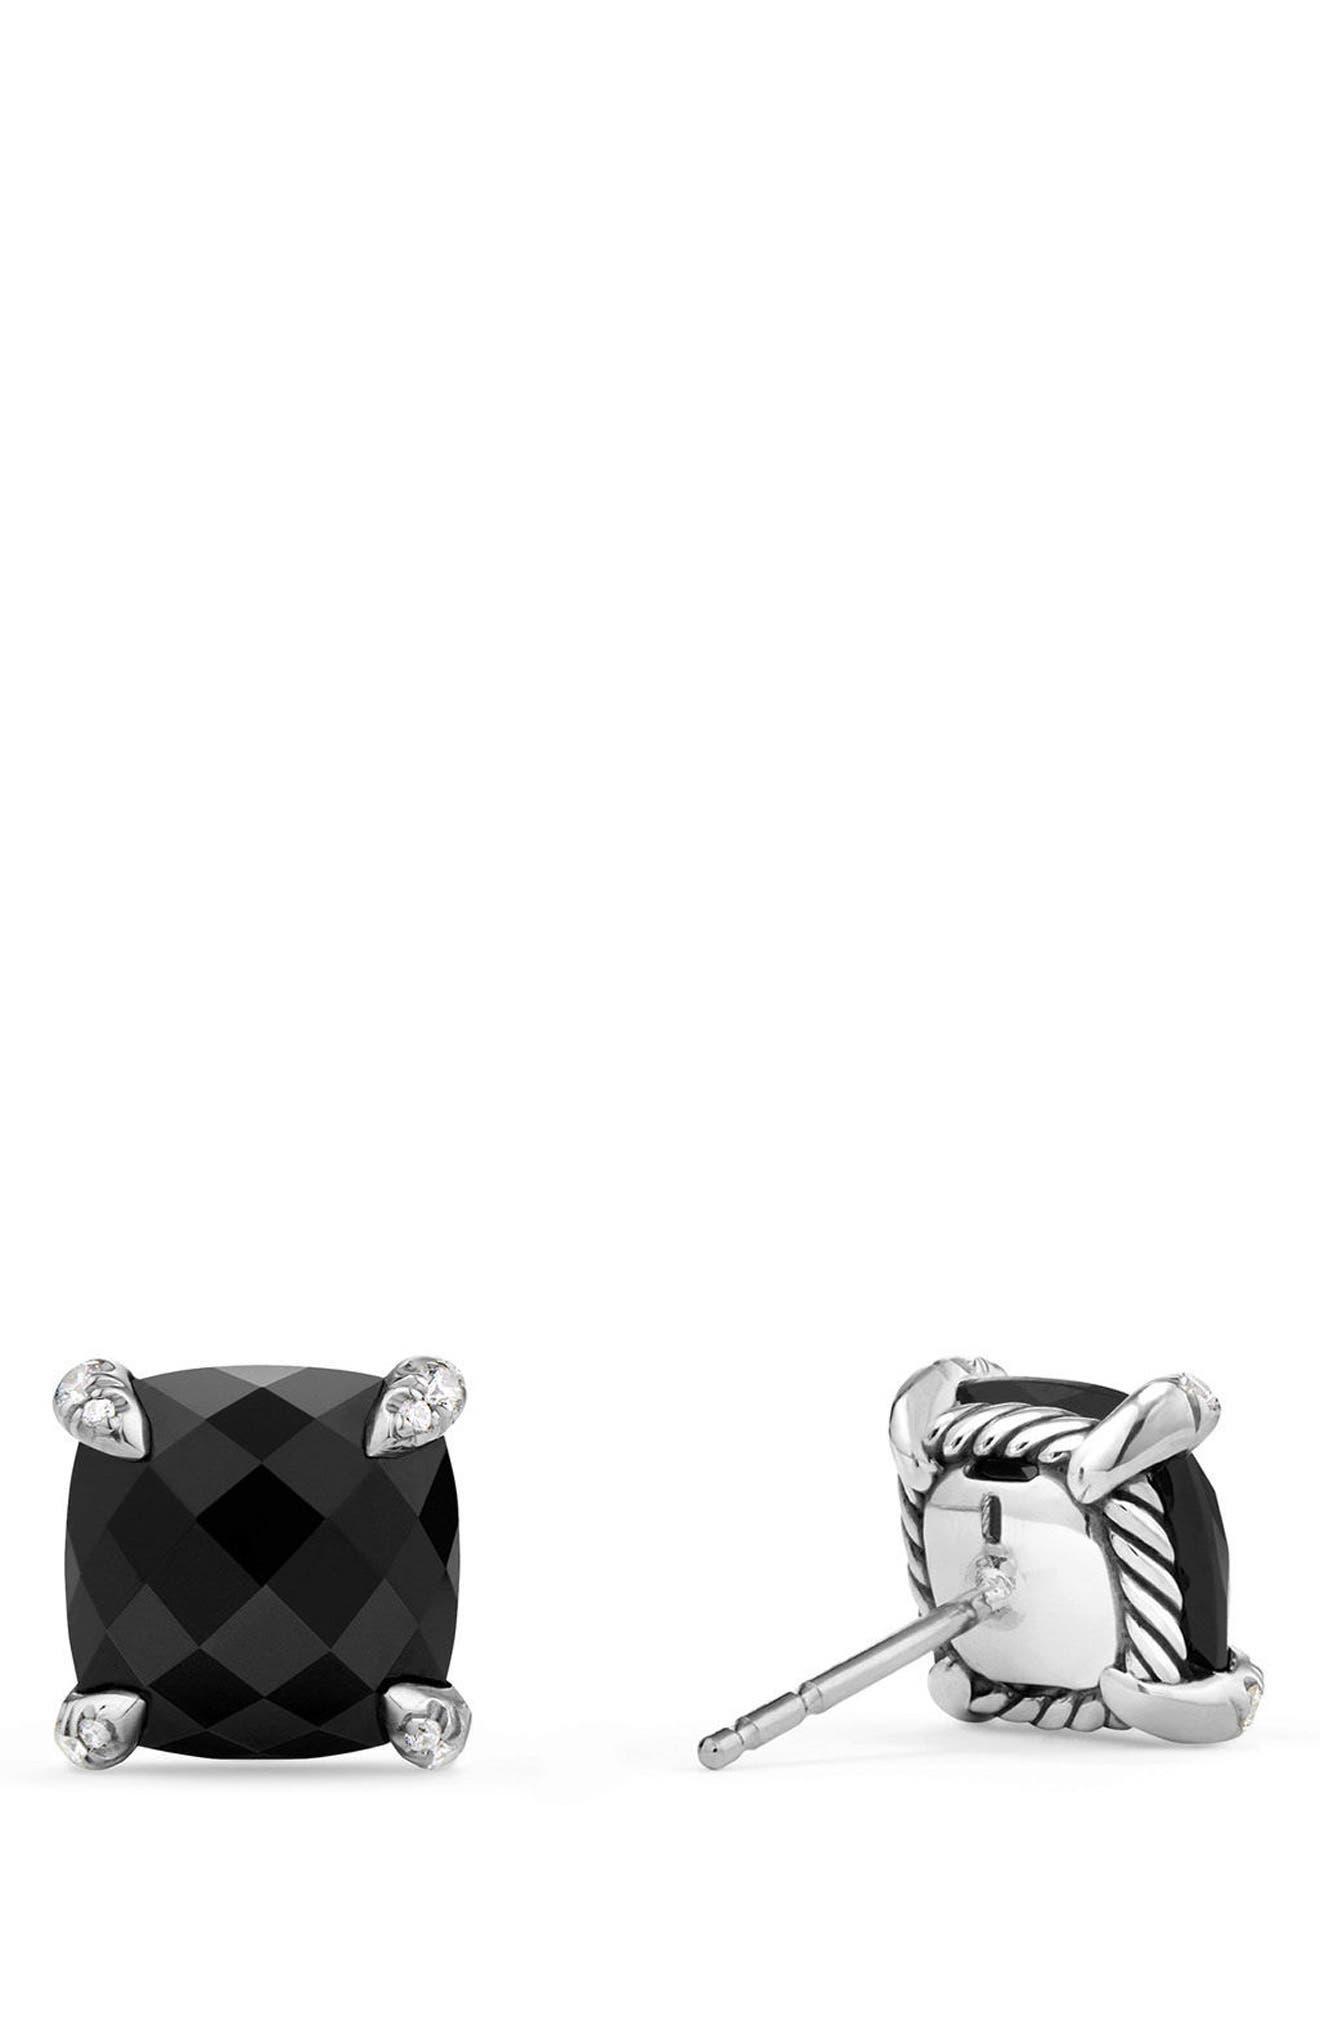 Châtelaine Earrings with Diamonds,                         Main,                         color, BLACK ONYX?